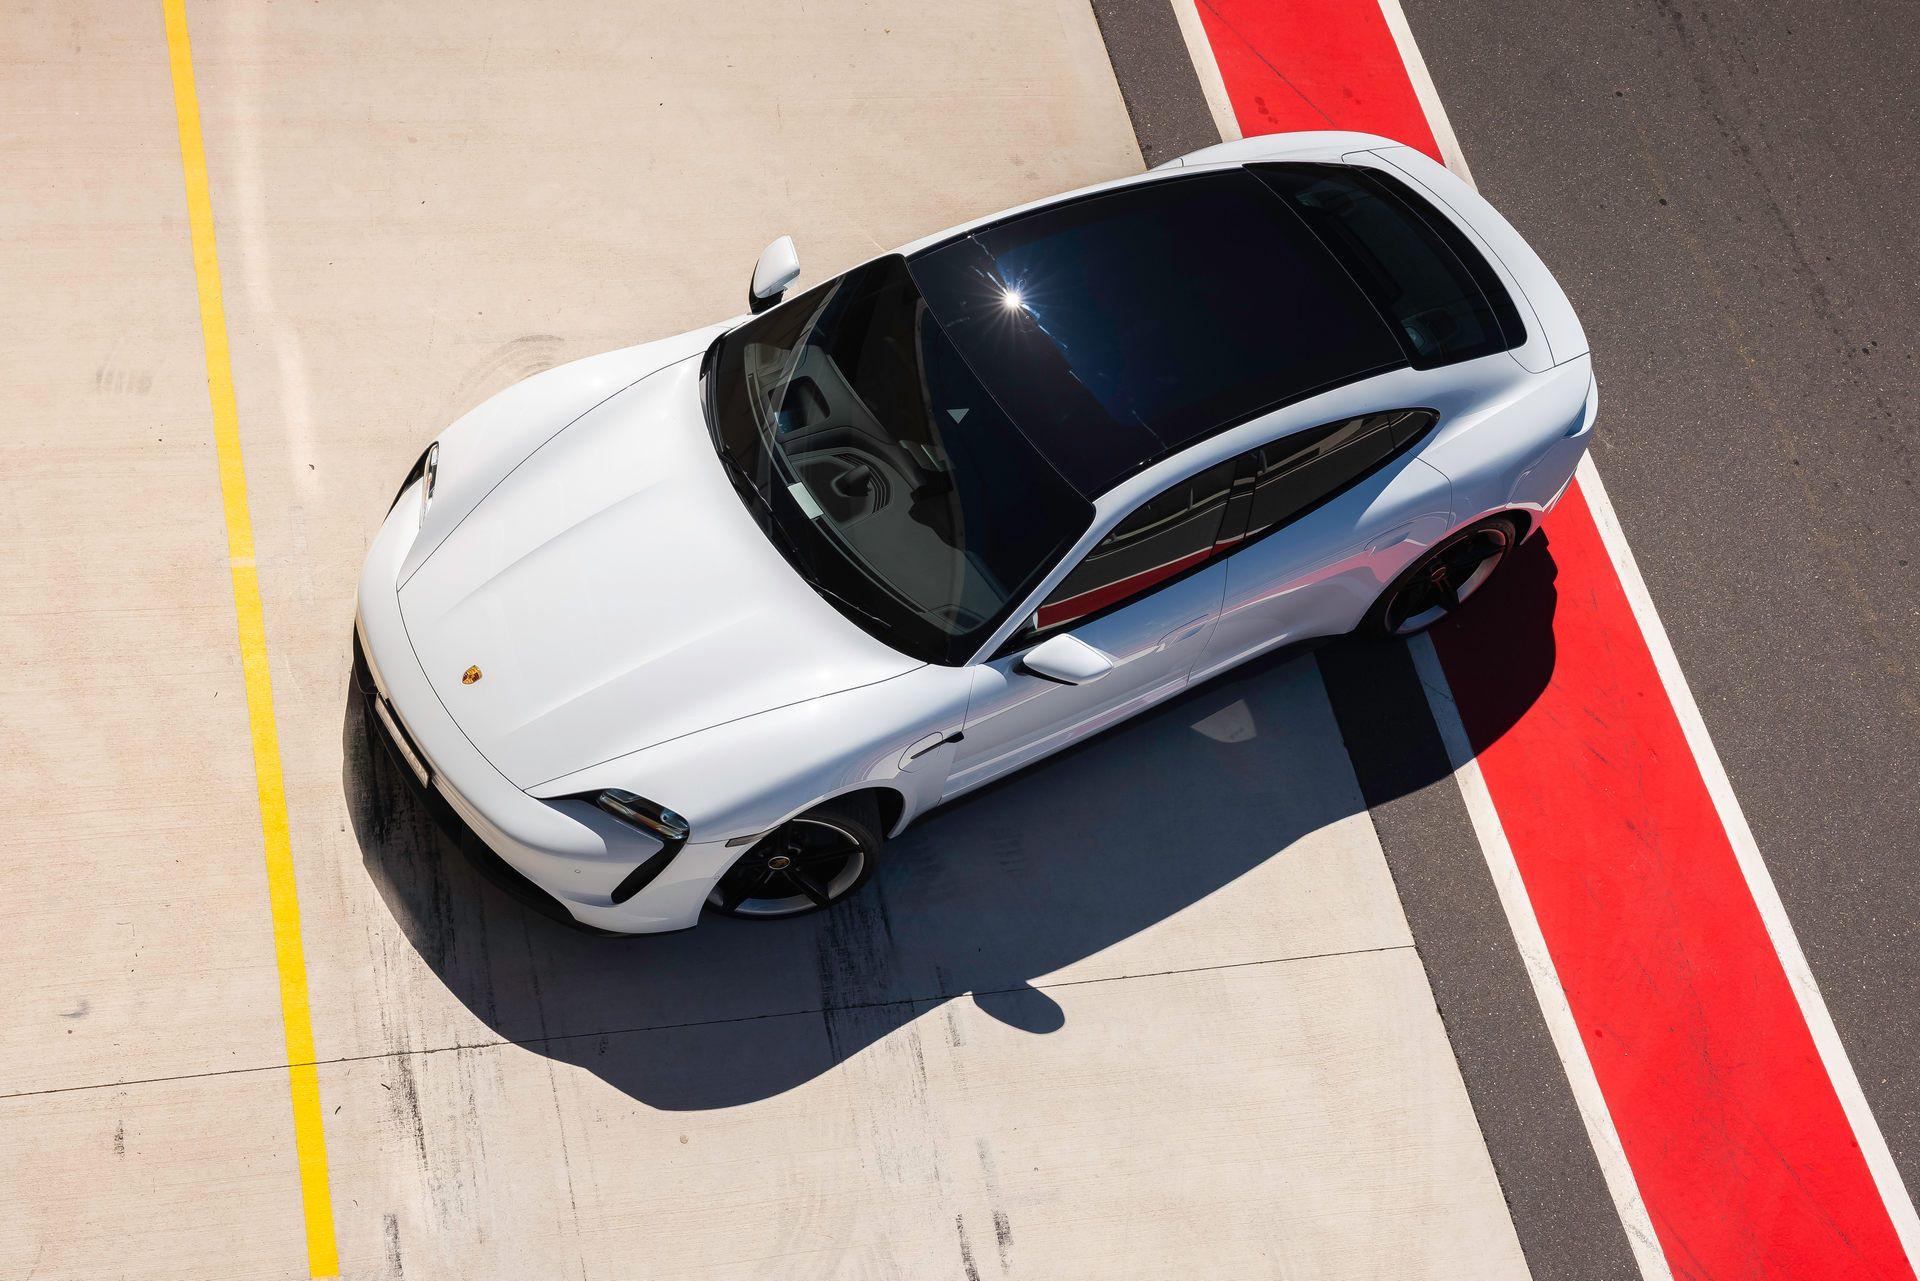 Porsche-Taycan-Turbo-S-The-Bend-Motorsport-Park-17